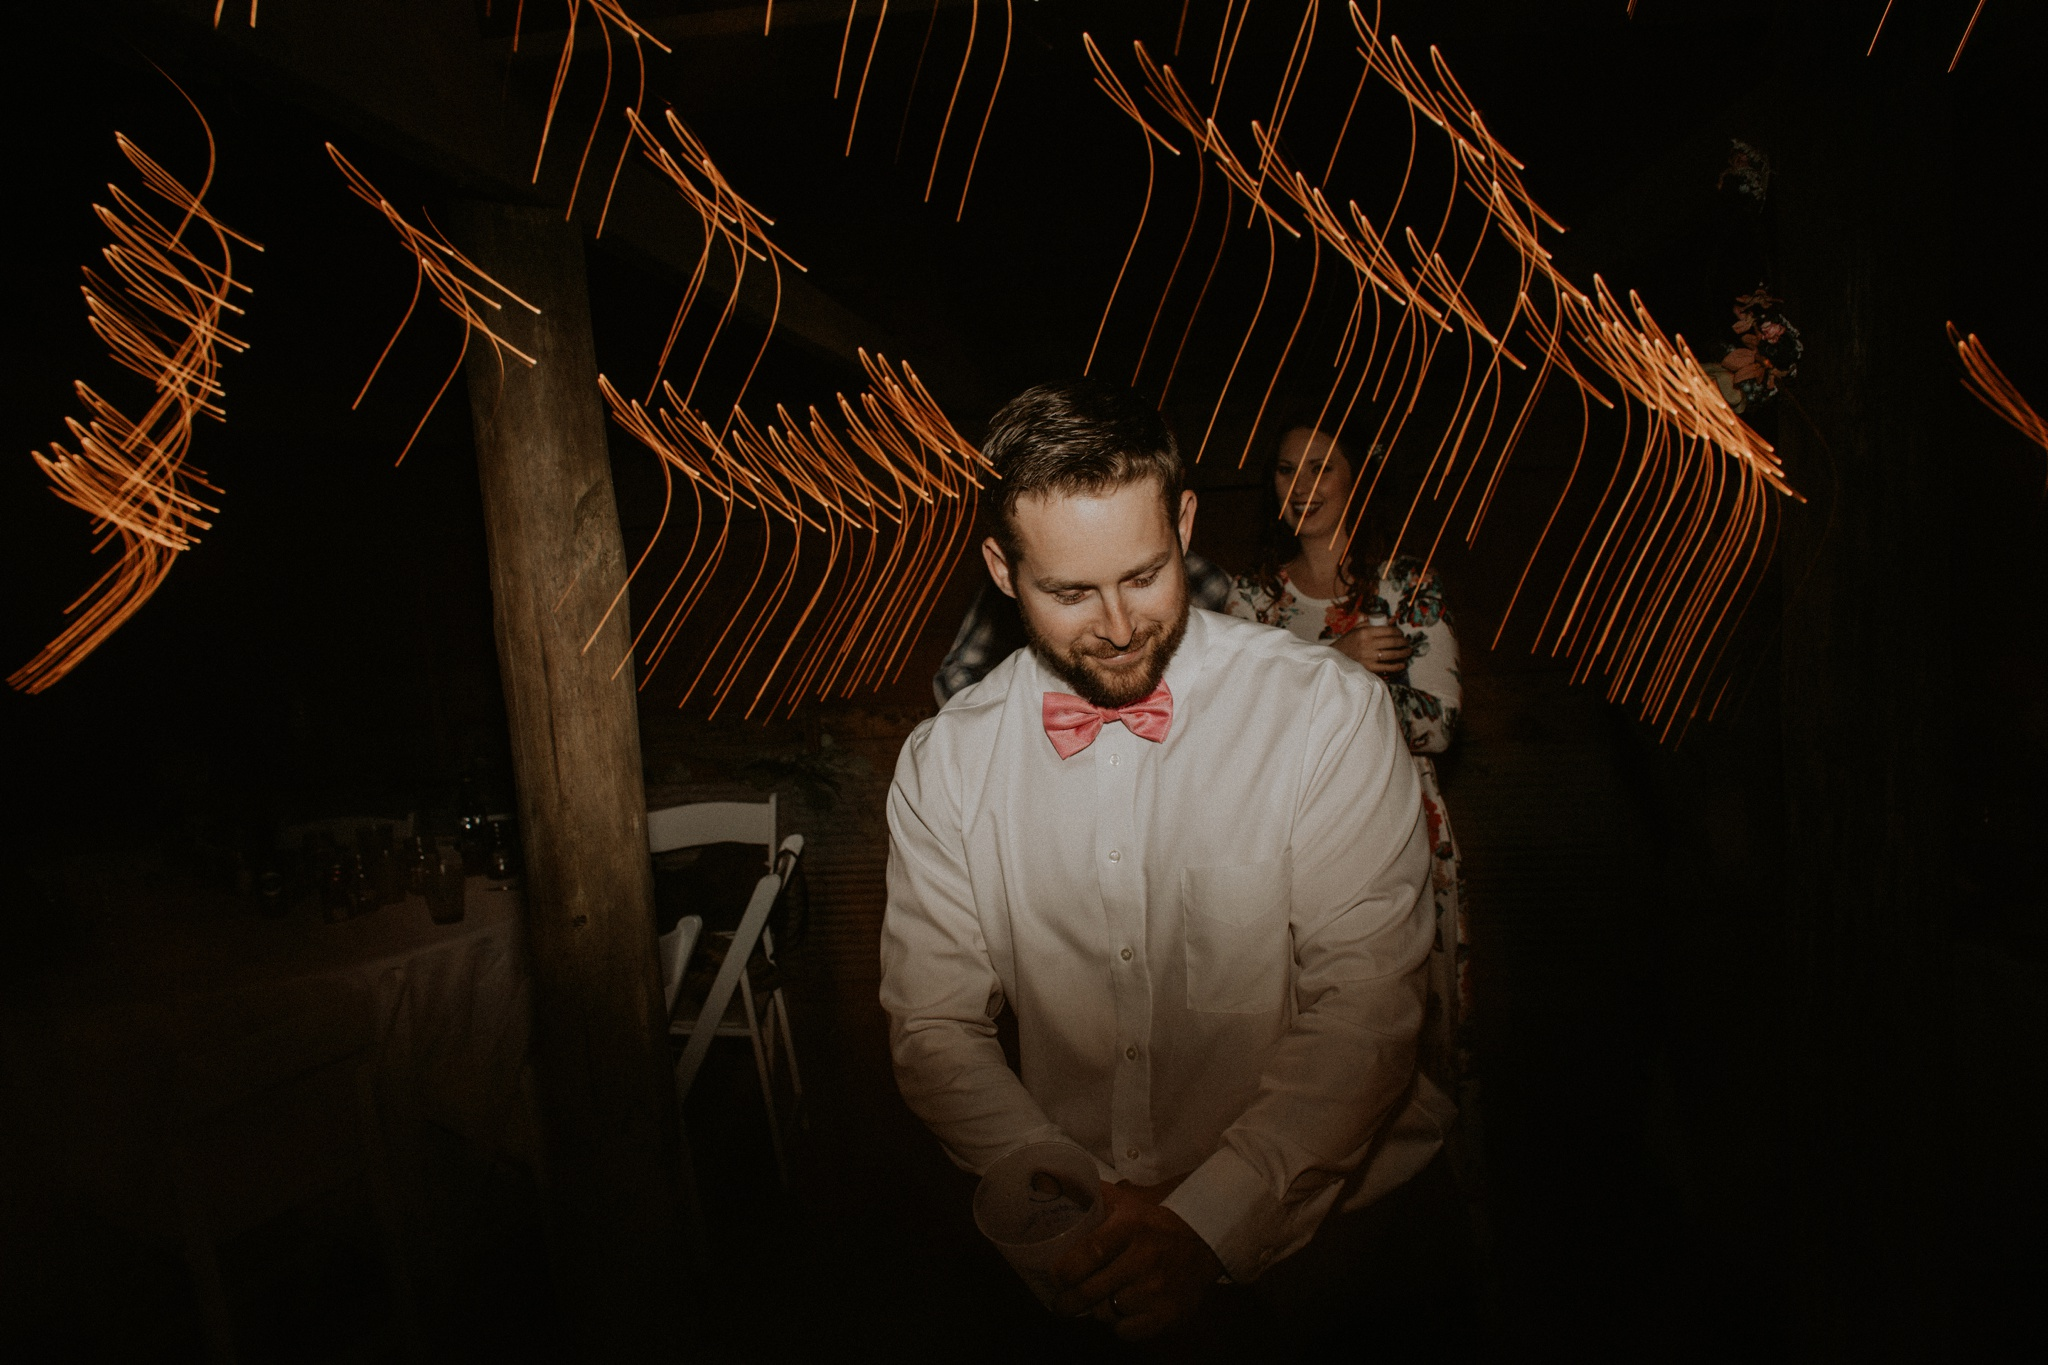 trinjensen photography, nebraska outdoor wedding photographer_3104.jpg